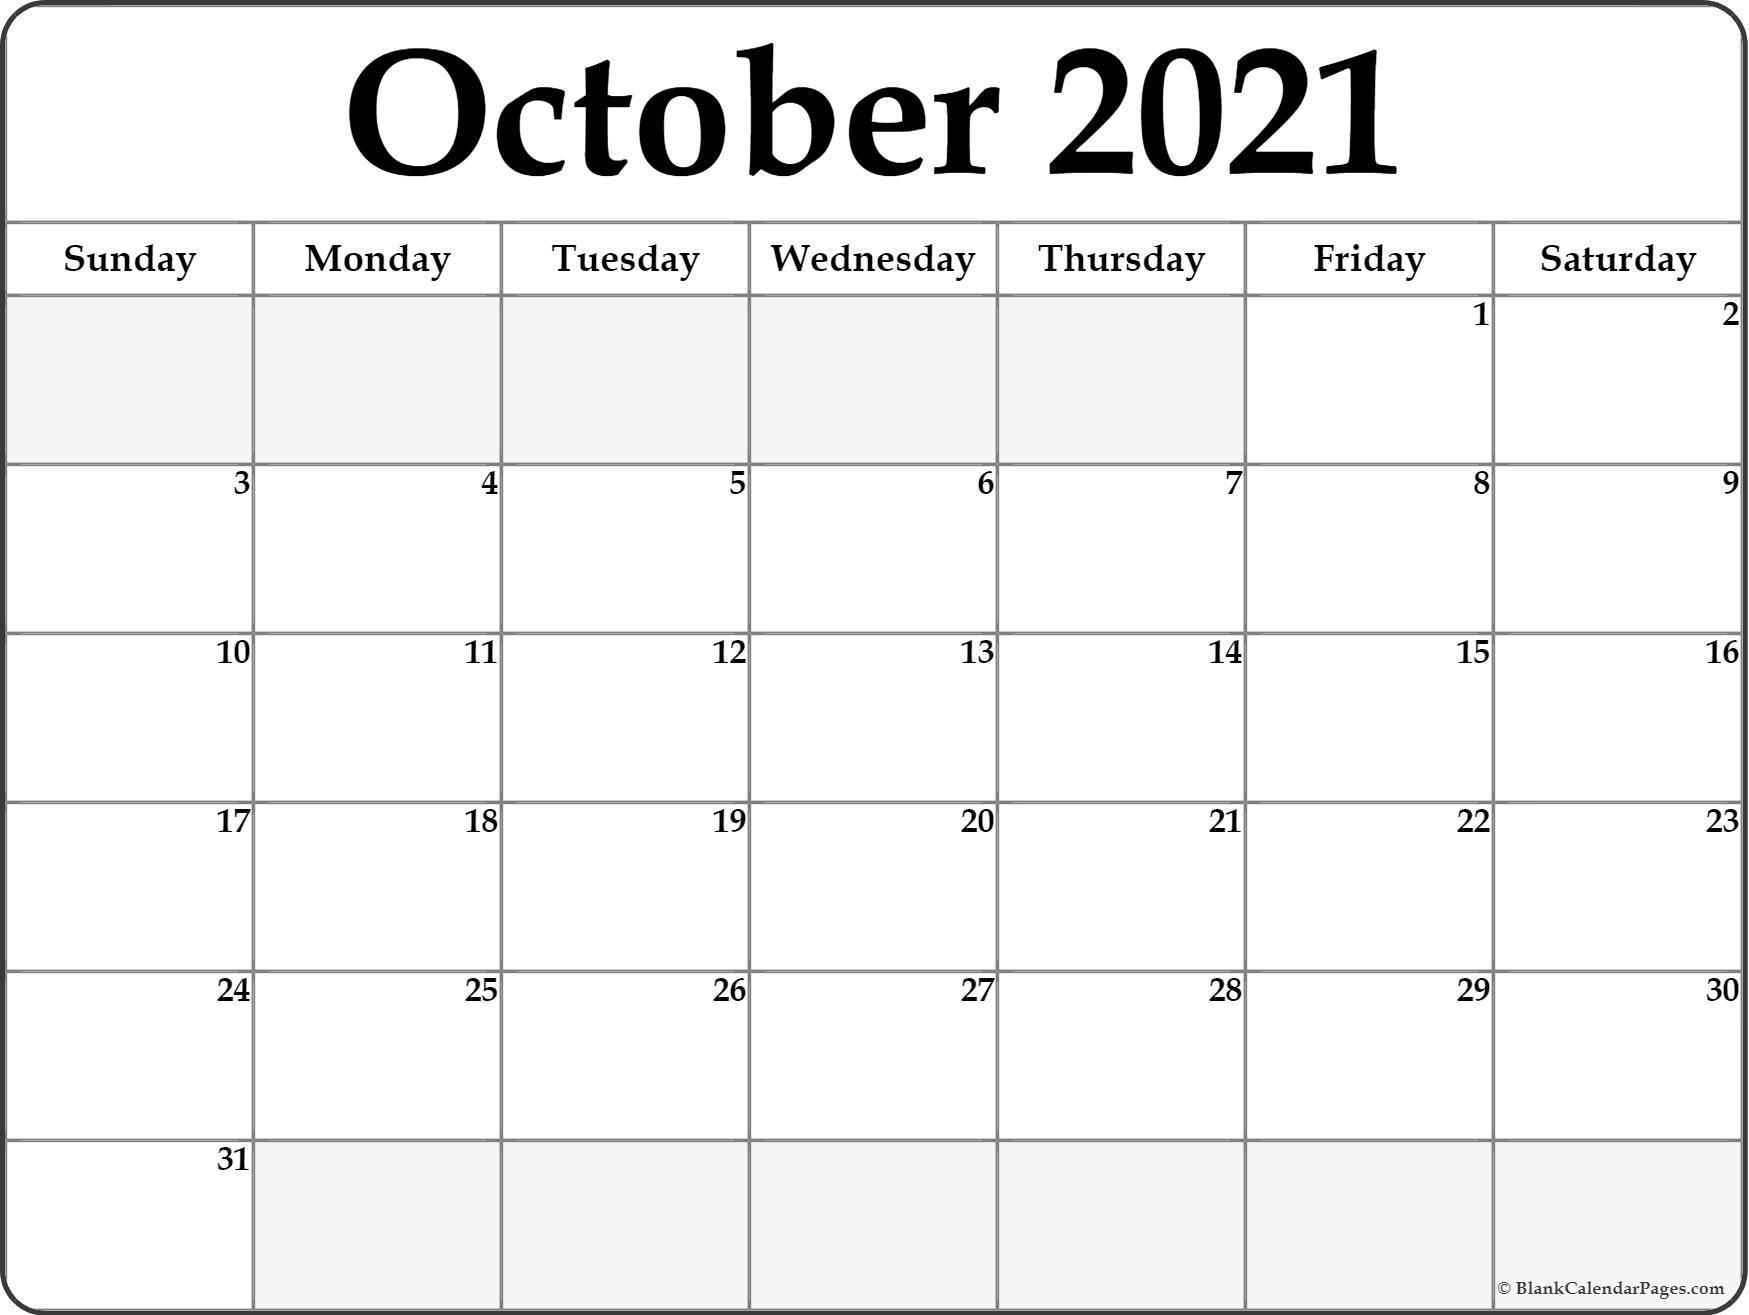 October 2021 Calendar | Free Printable Monthly Calendars